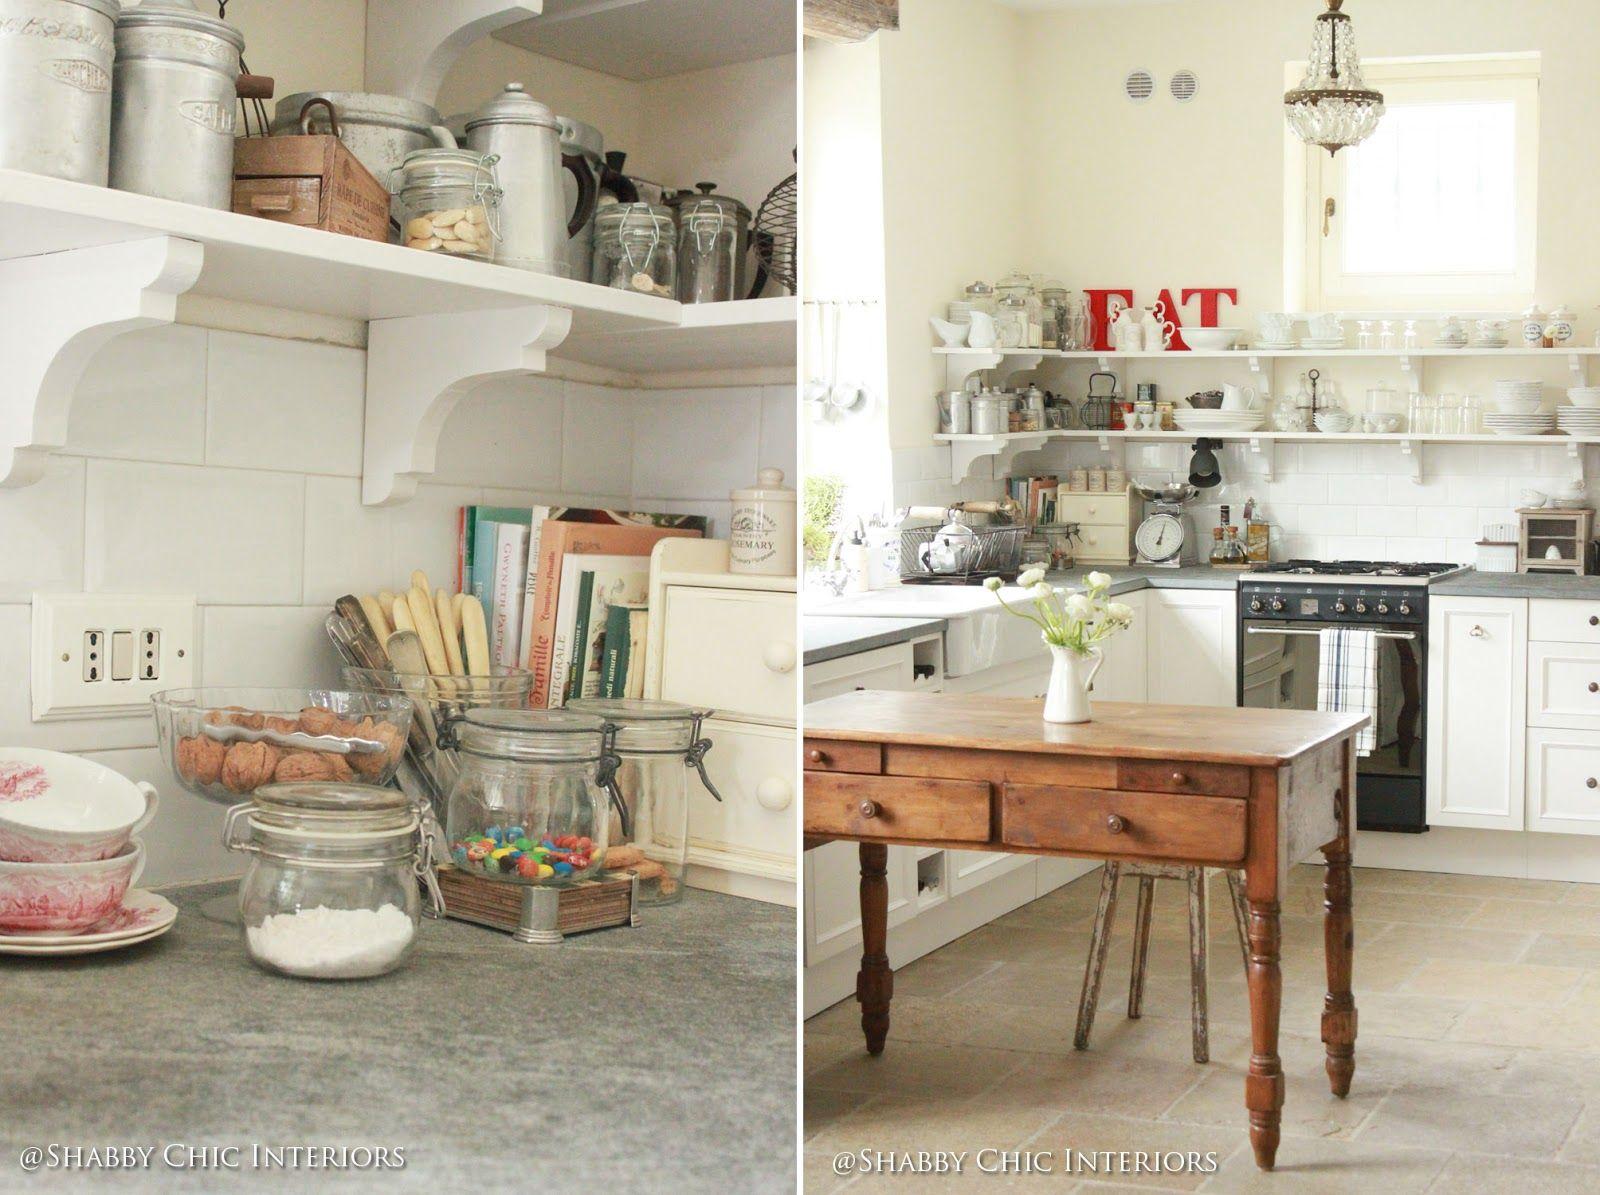 Shabby Chic Interiors: Restyling di una cucina Ikea | Aspiring ...